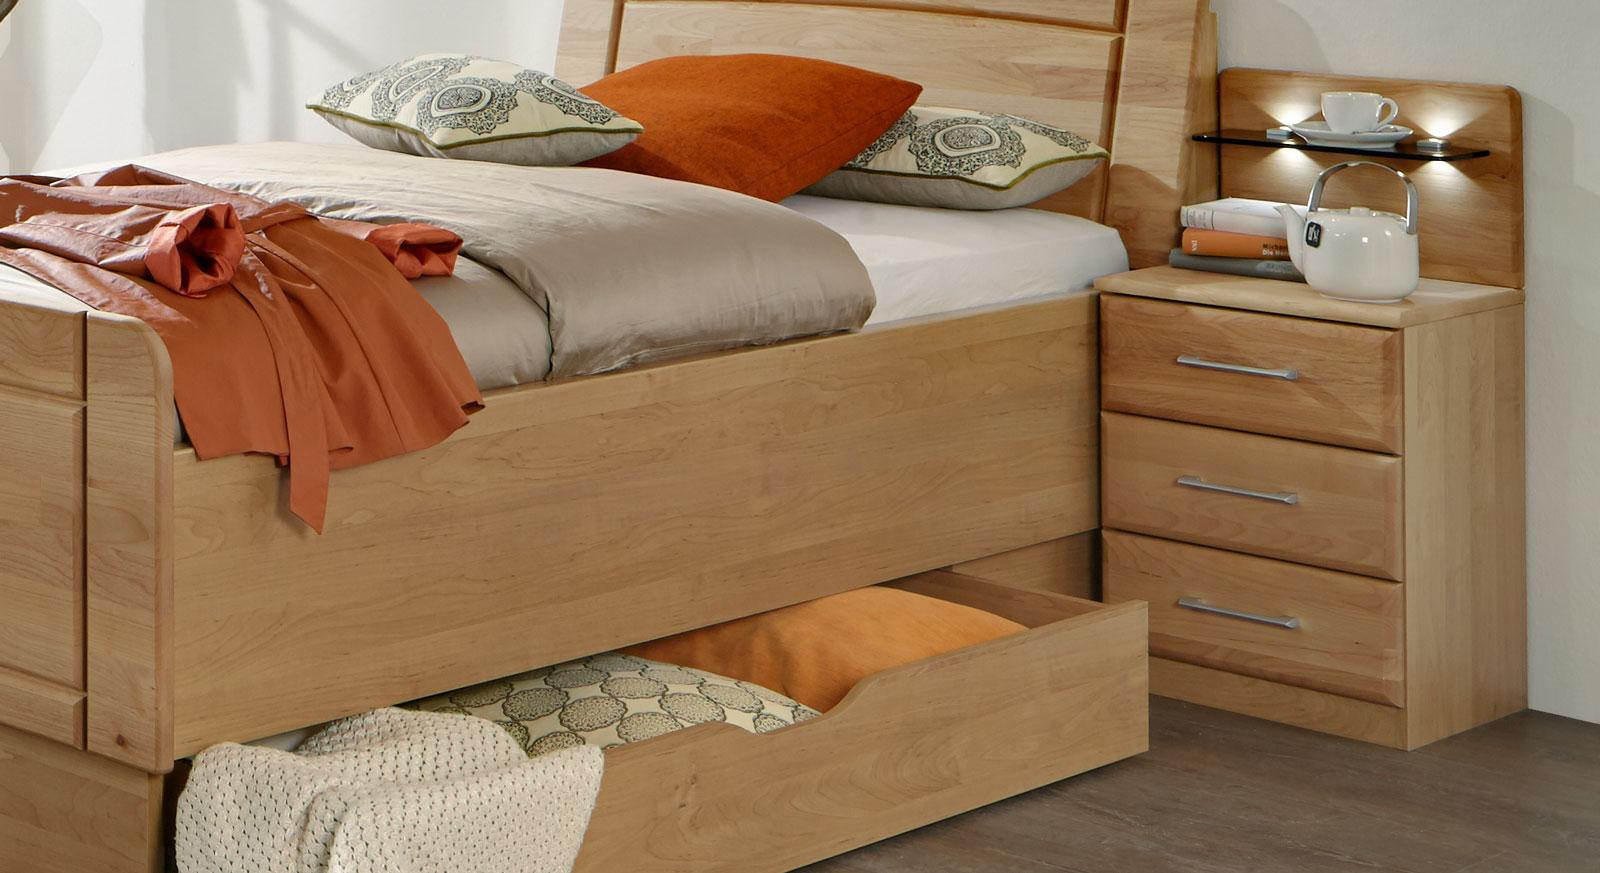 nachtkonsole mit schubladen beleuchtung erle teilmassiv. Black Bedroom Furniture Sets. Home Design Ideas